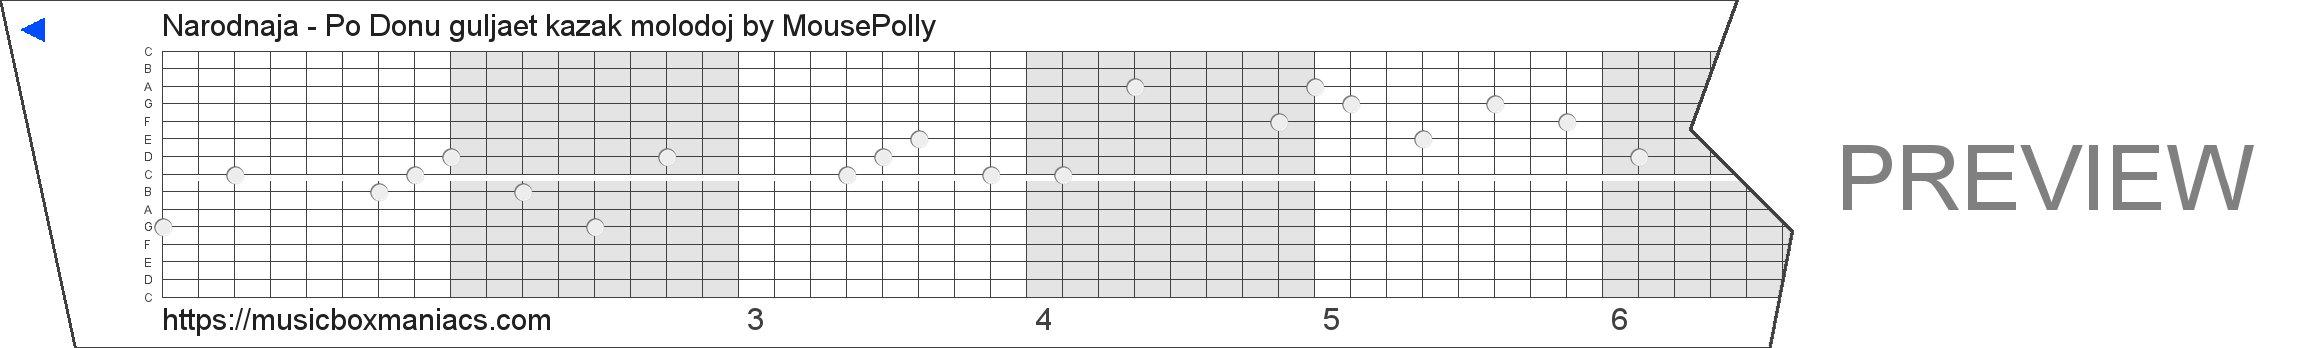 Narodnaja - Po Donu guljaet kazak molodoj 15 note music box paper strip